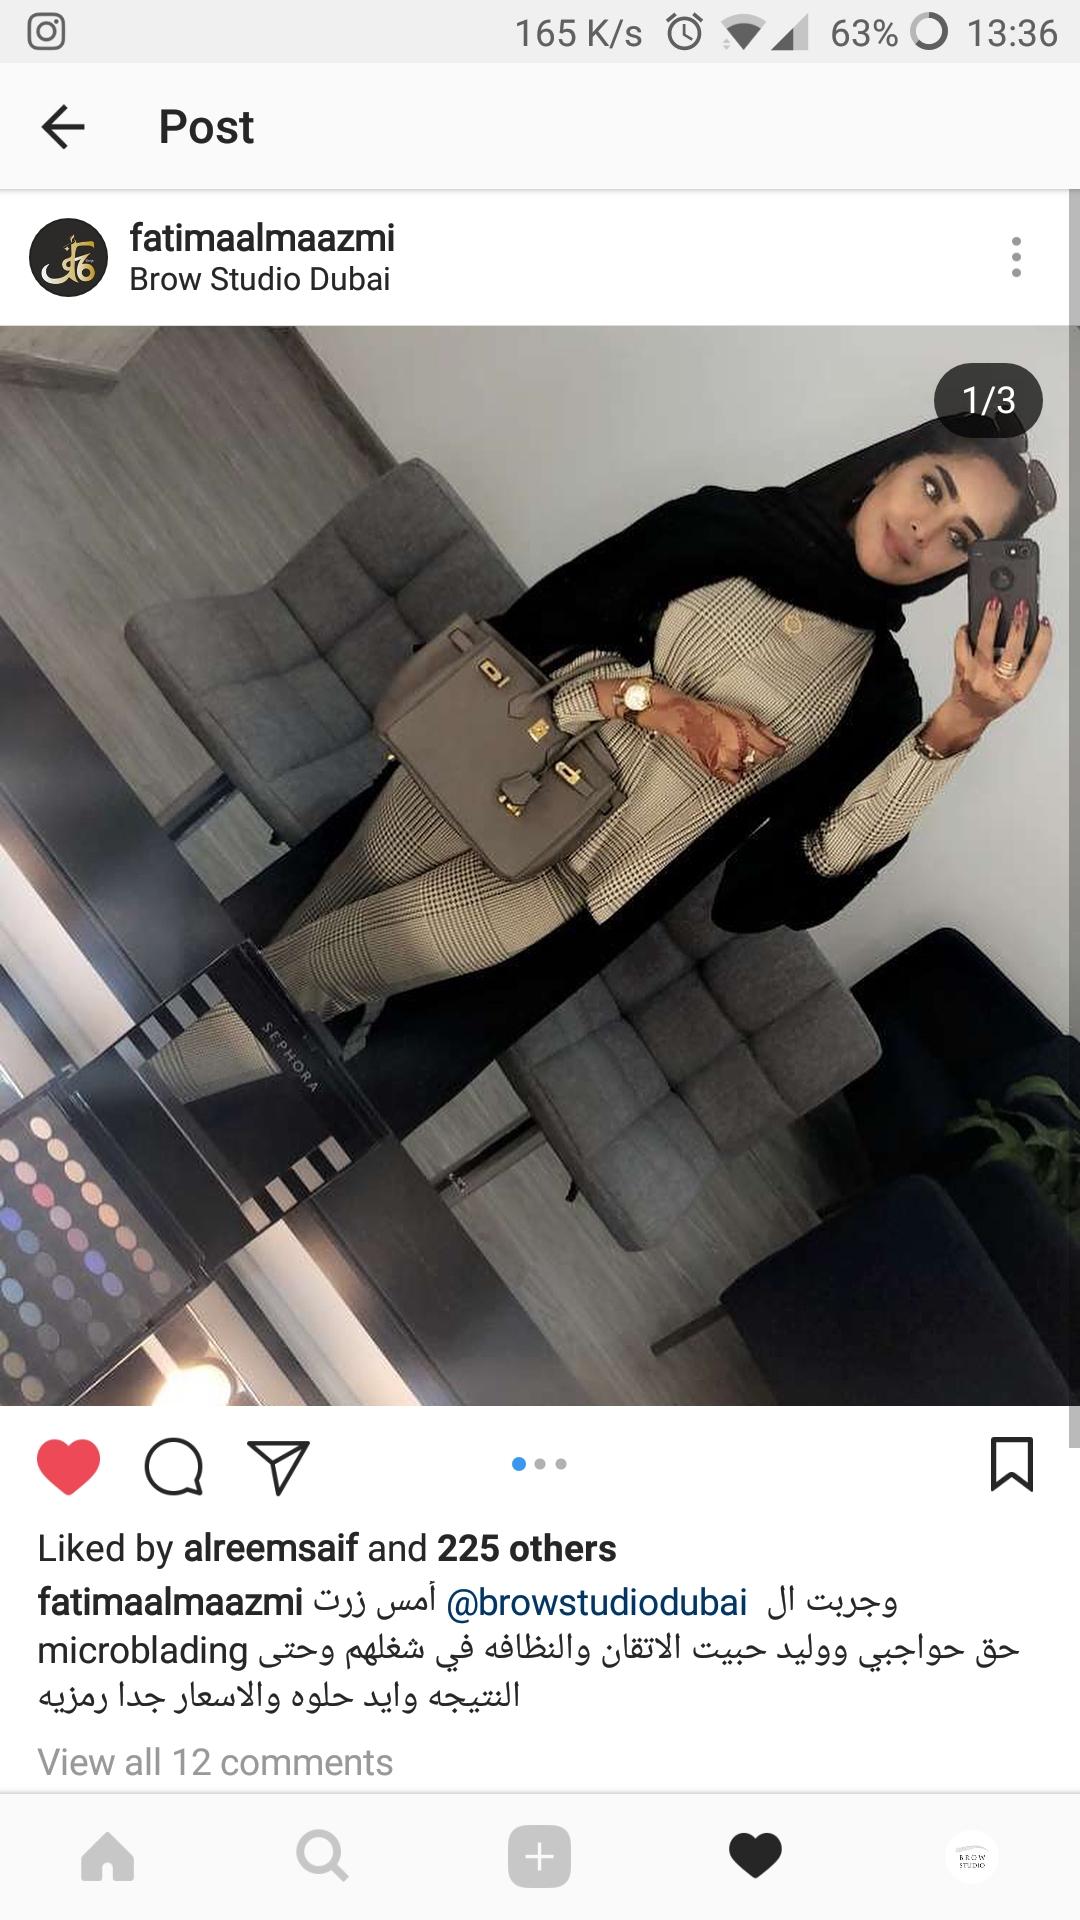 Fatima Al Maazmi